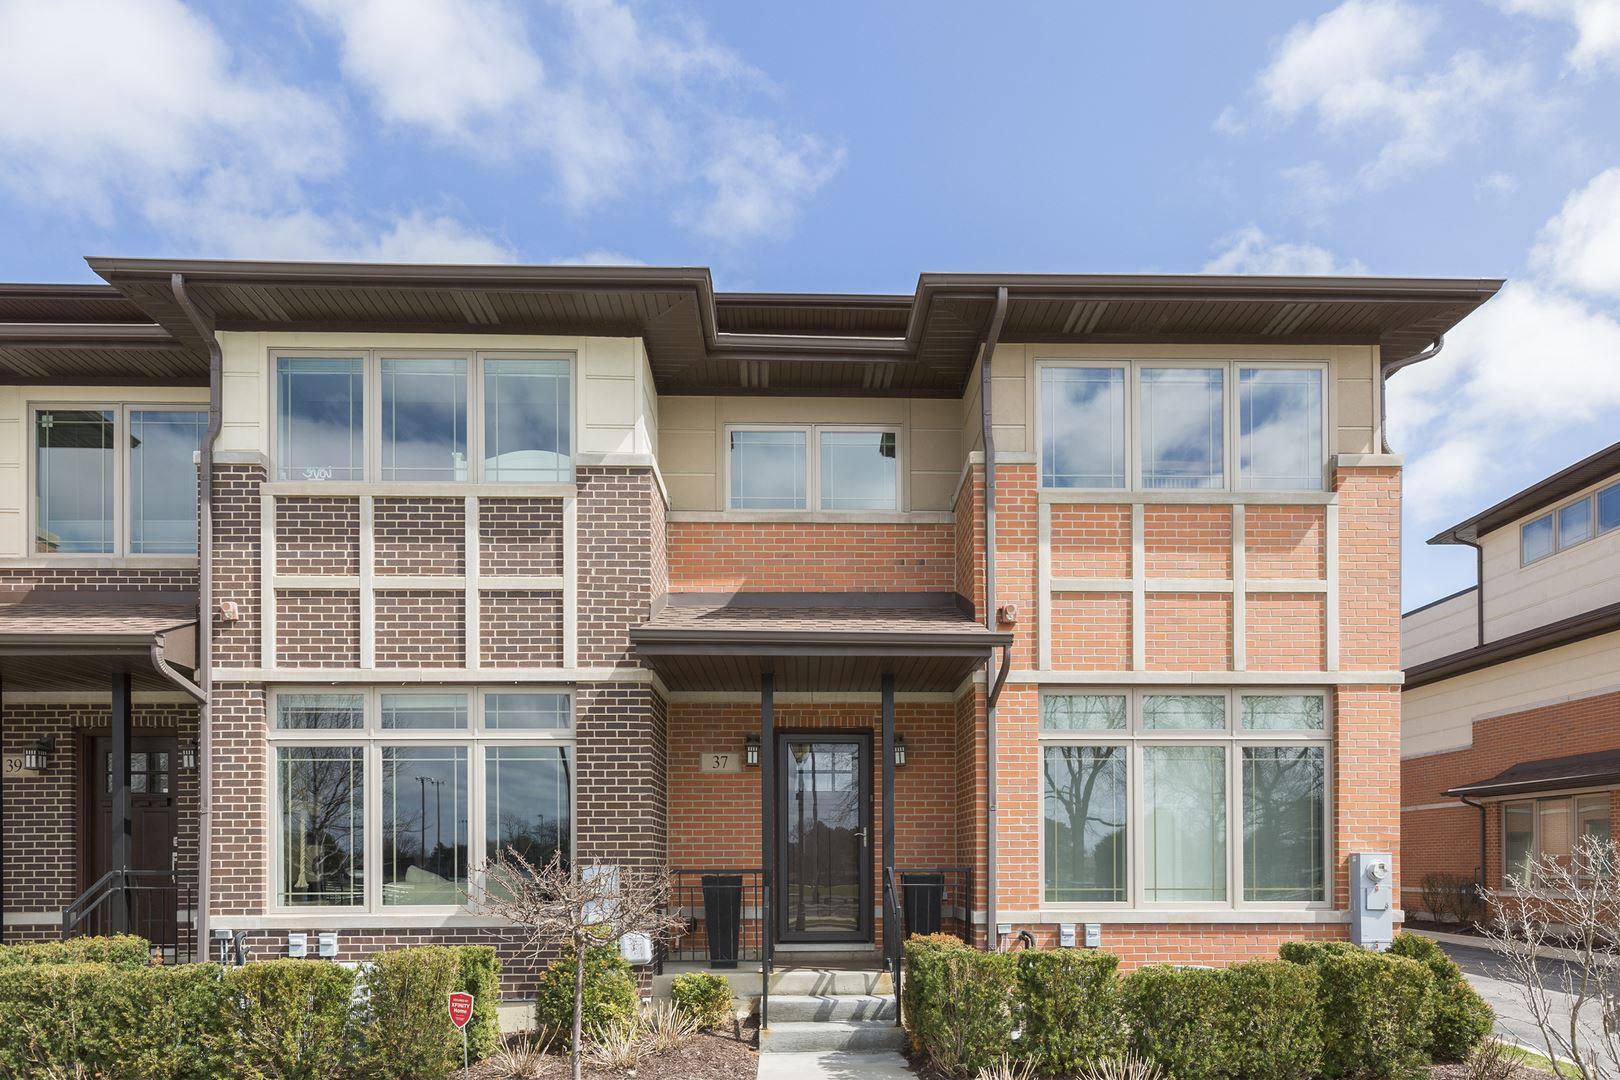 37 Morris Street, Park Ridge, IL 60068 - #: 10681913